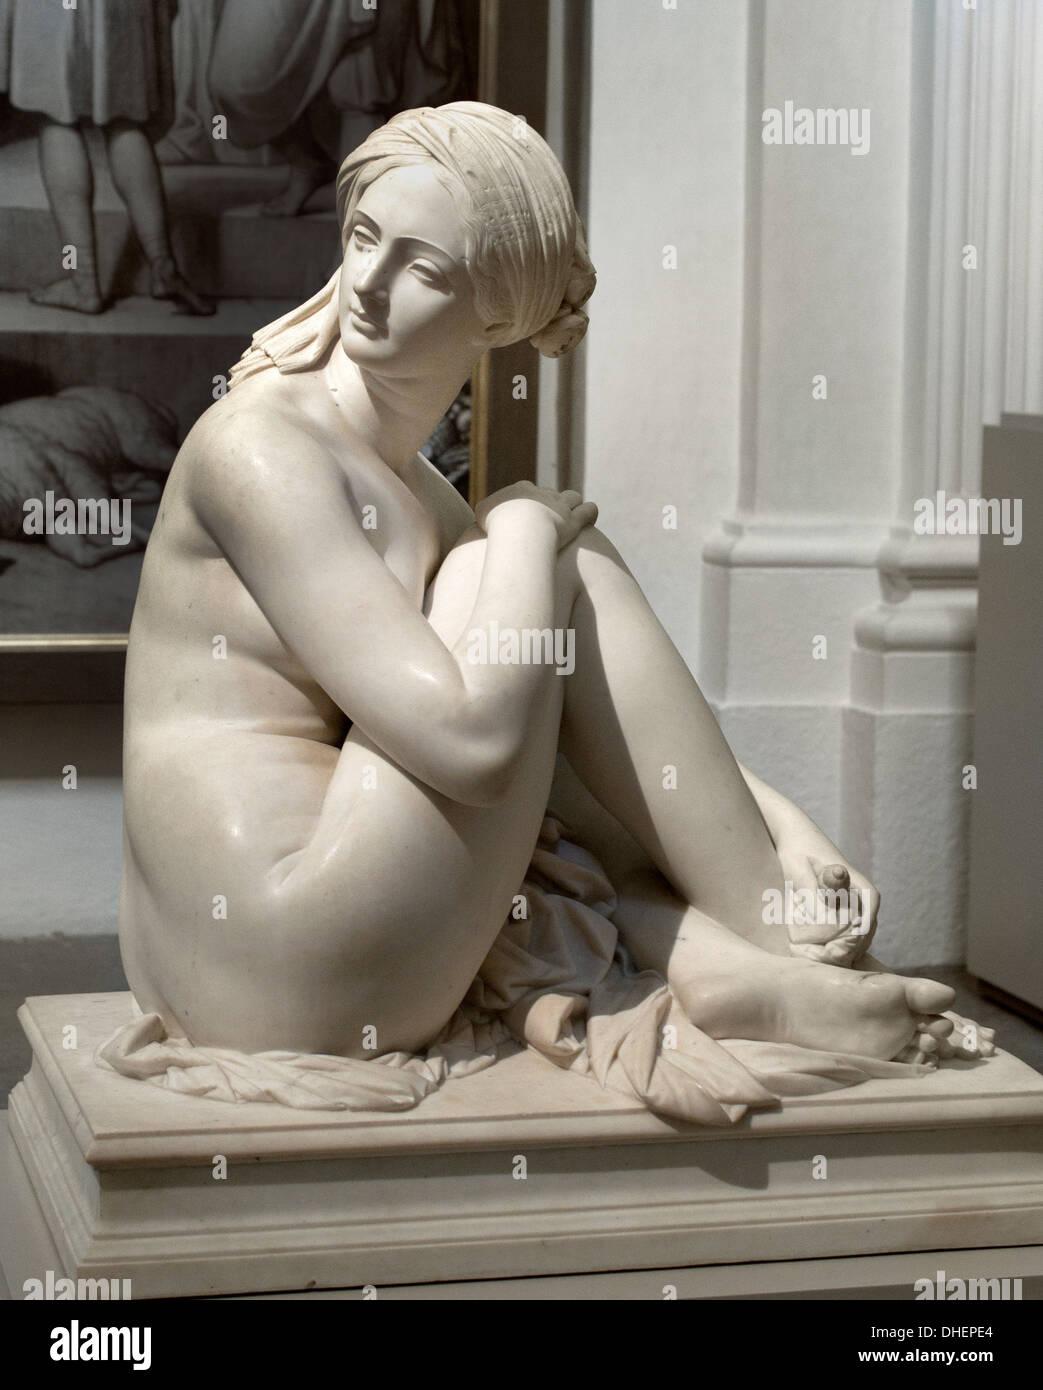 Female Slave Stock Photos & Female Slave Stock Images - Alamy